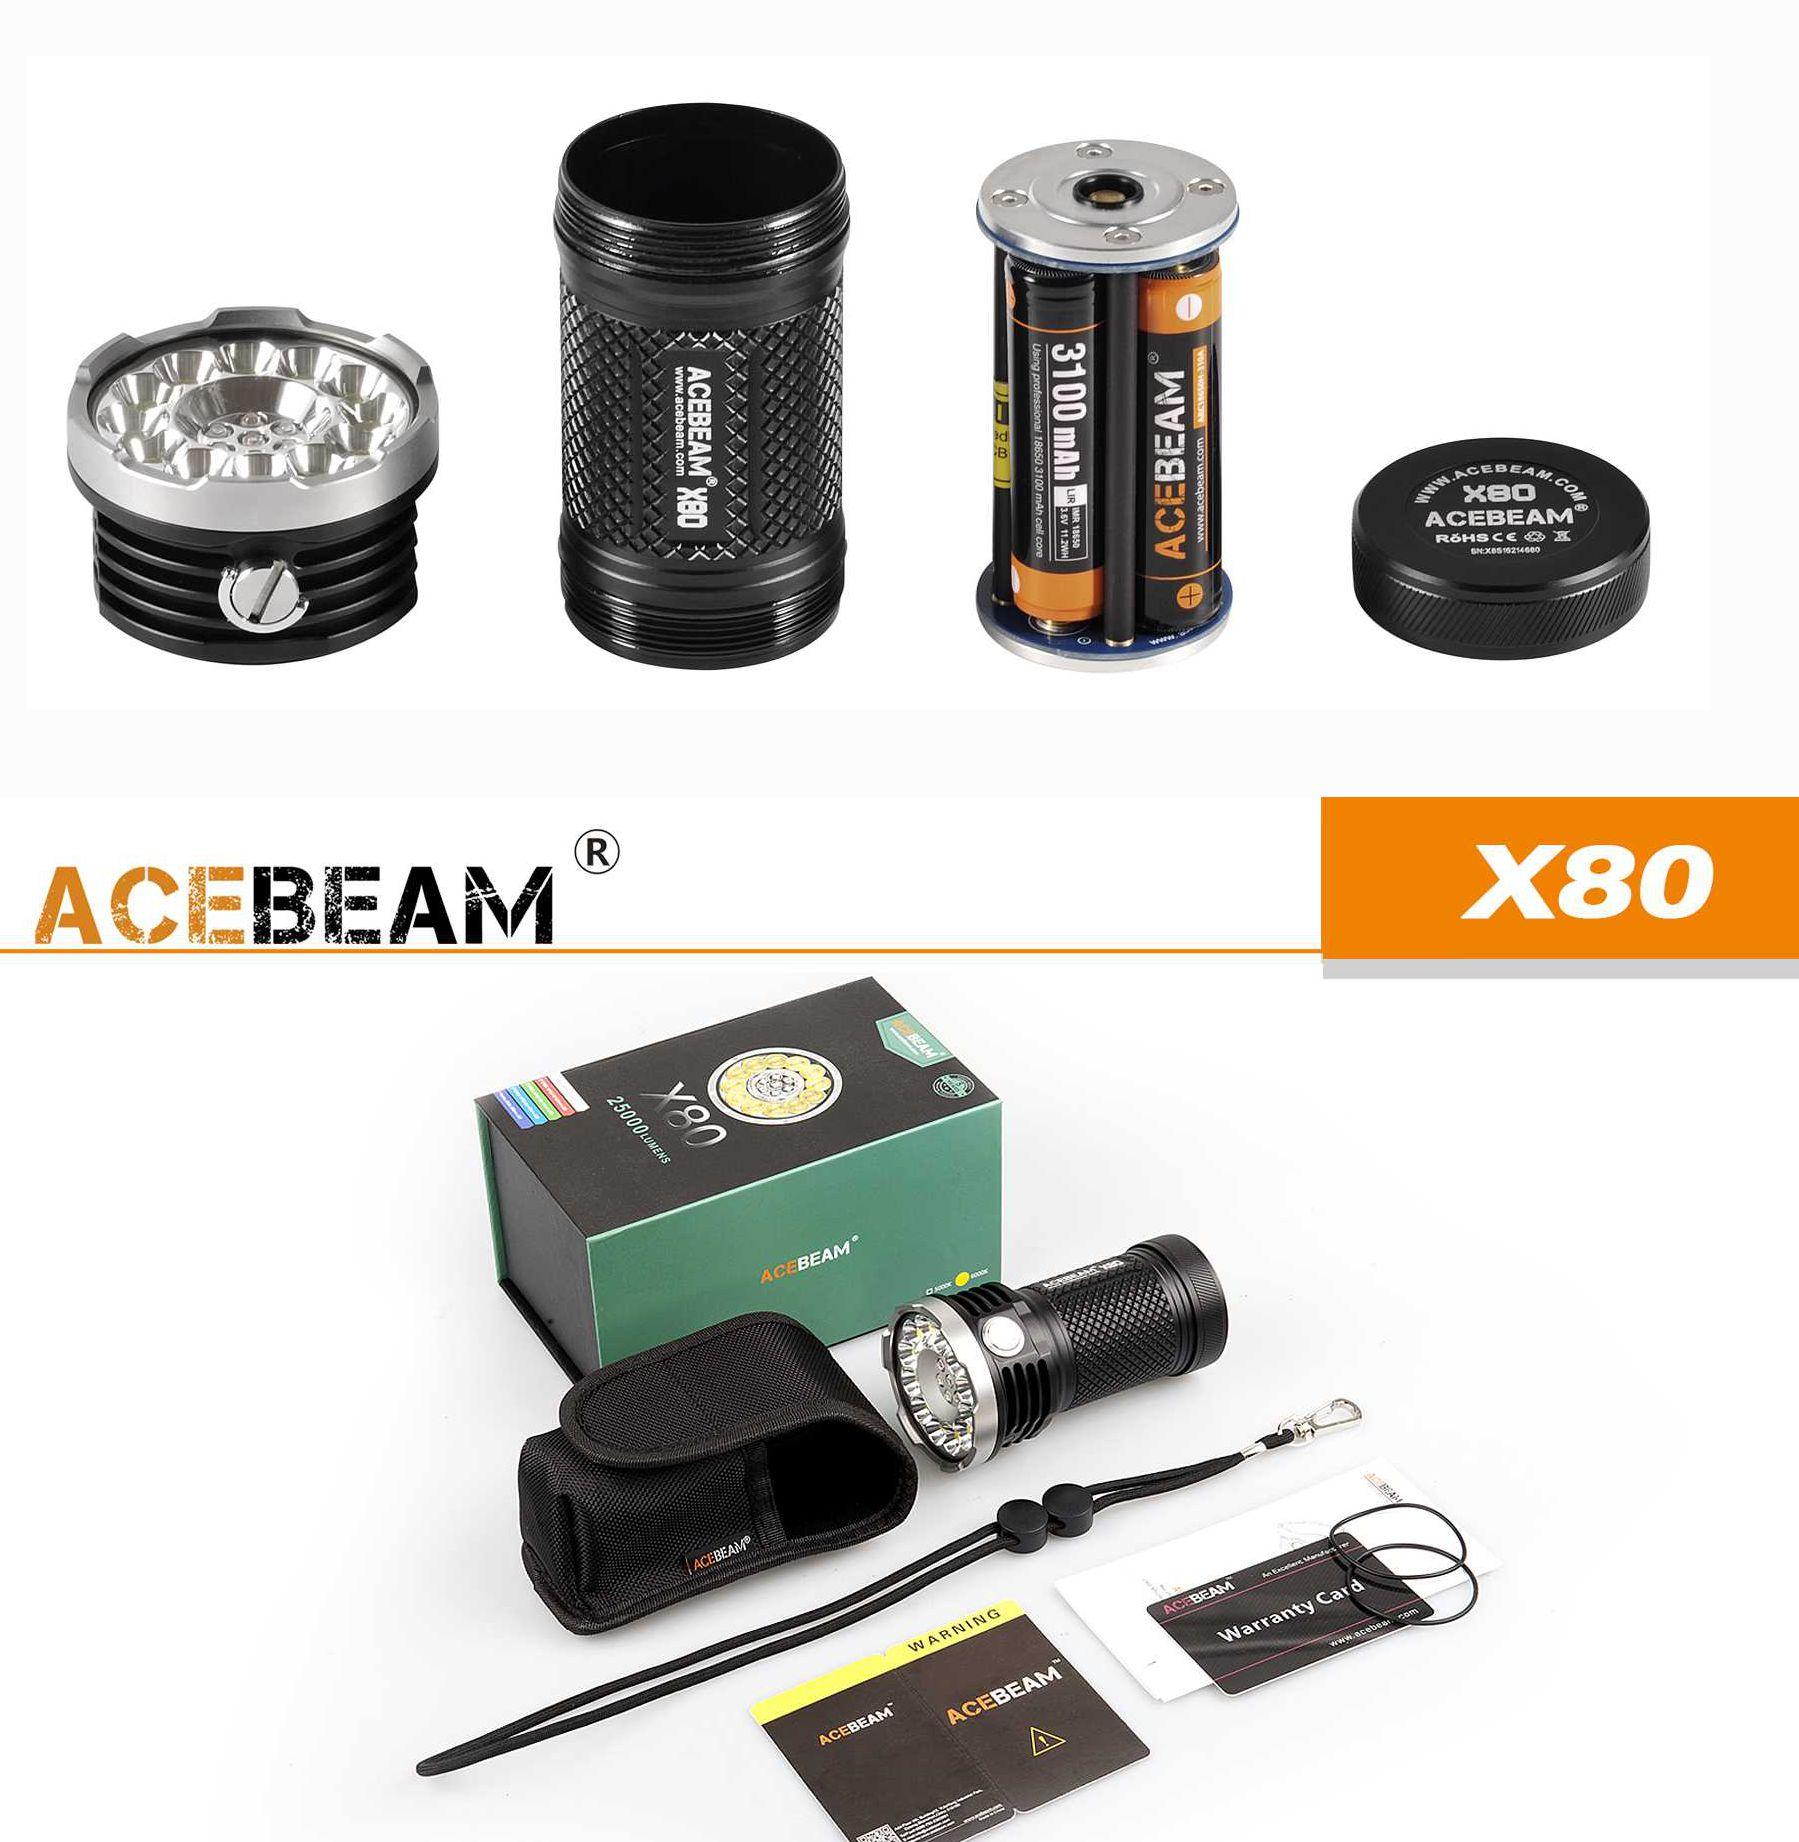 acebeam rgb x80